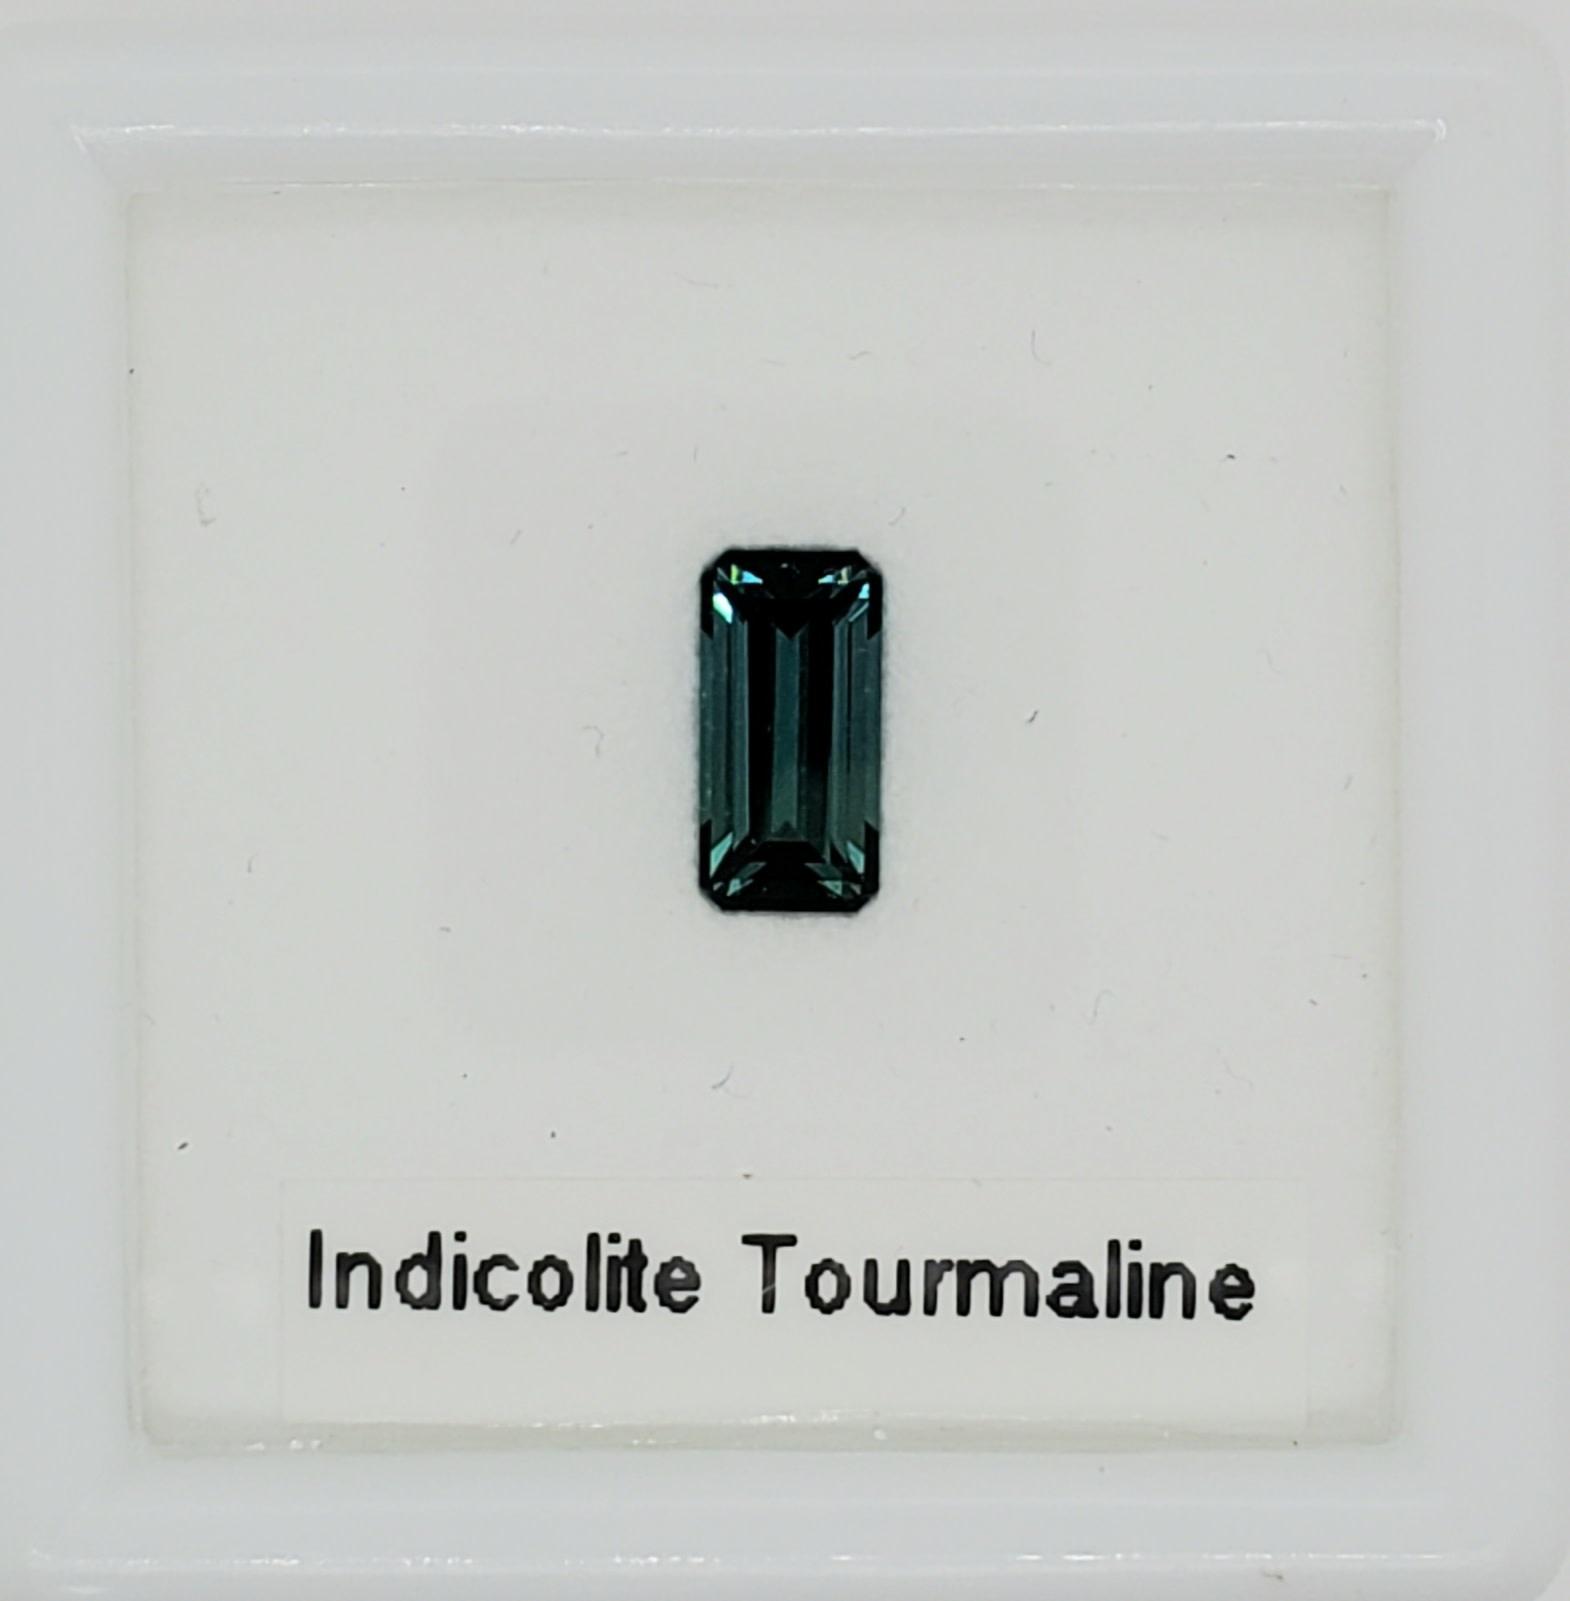 1.28 CT Loose Indicolite Tourmaline